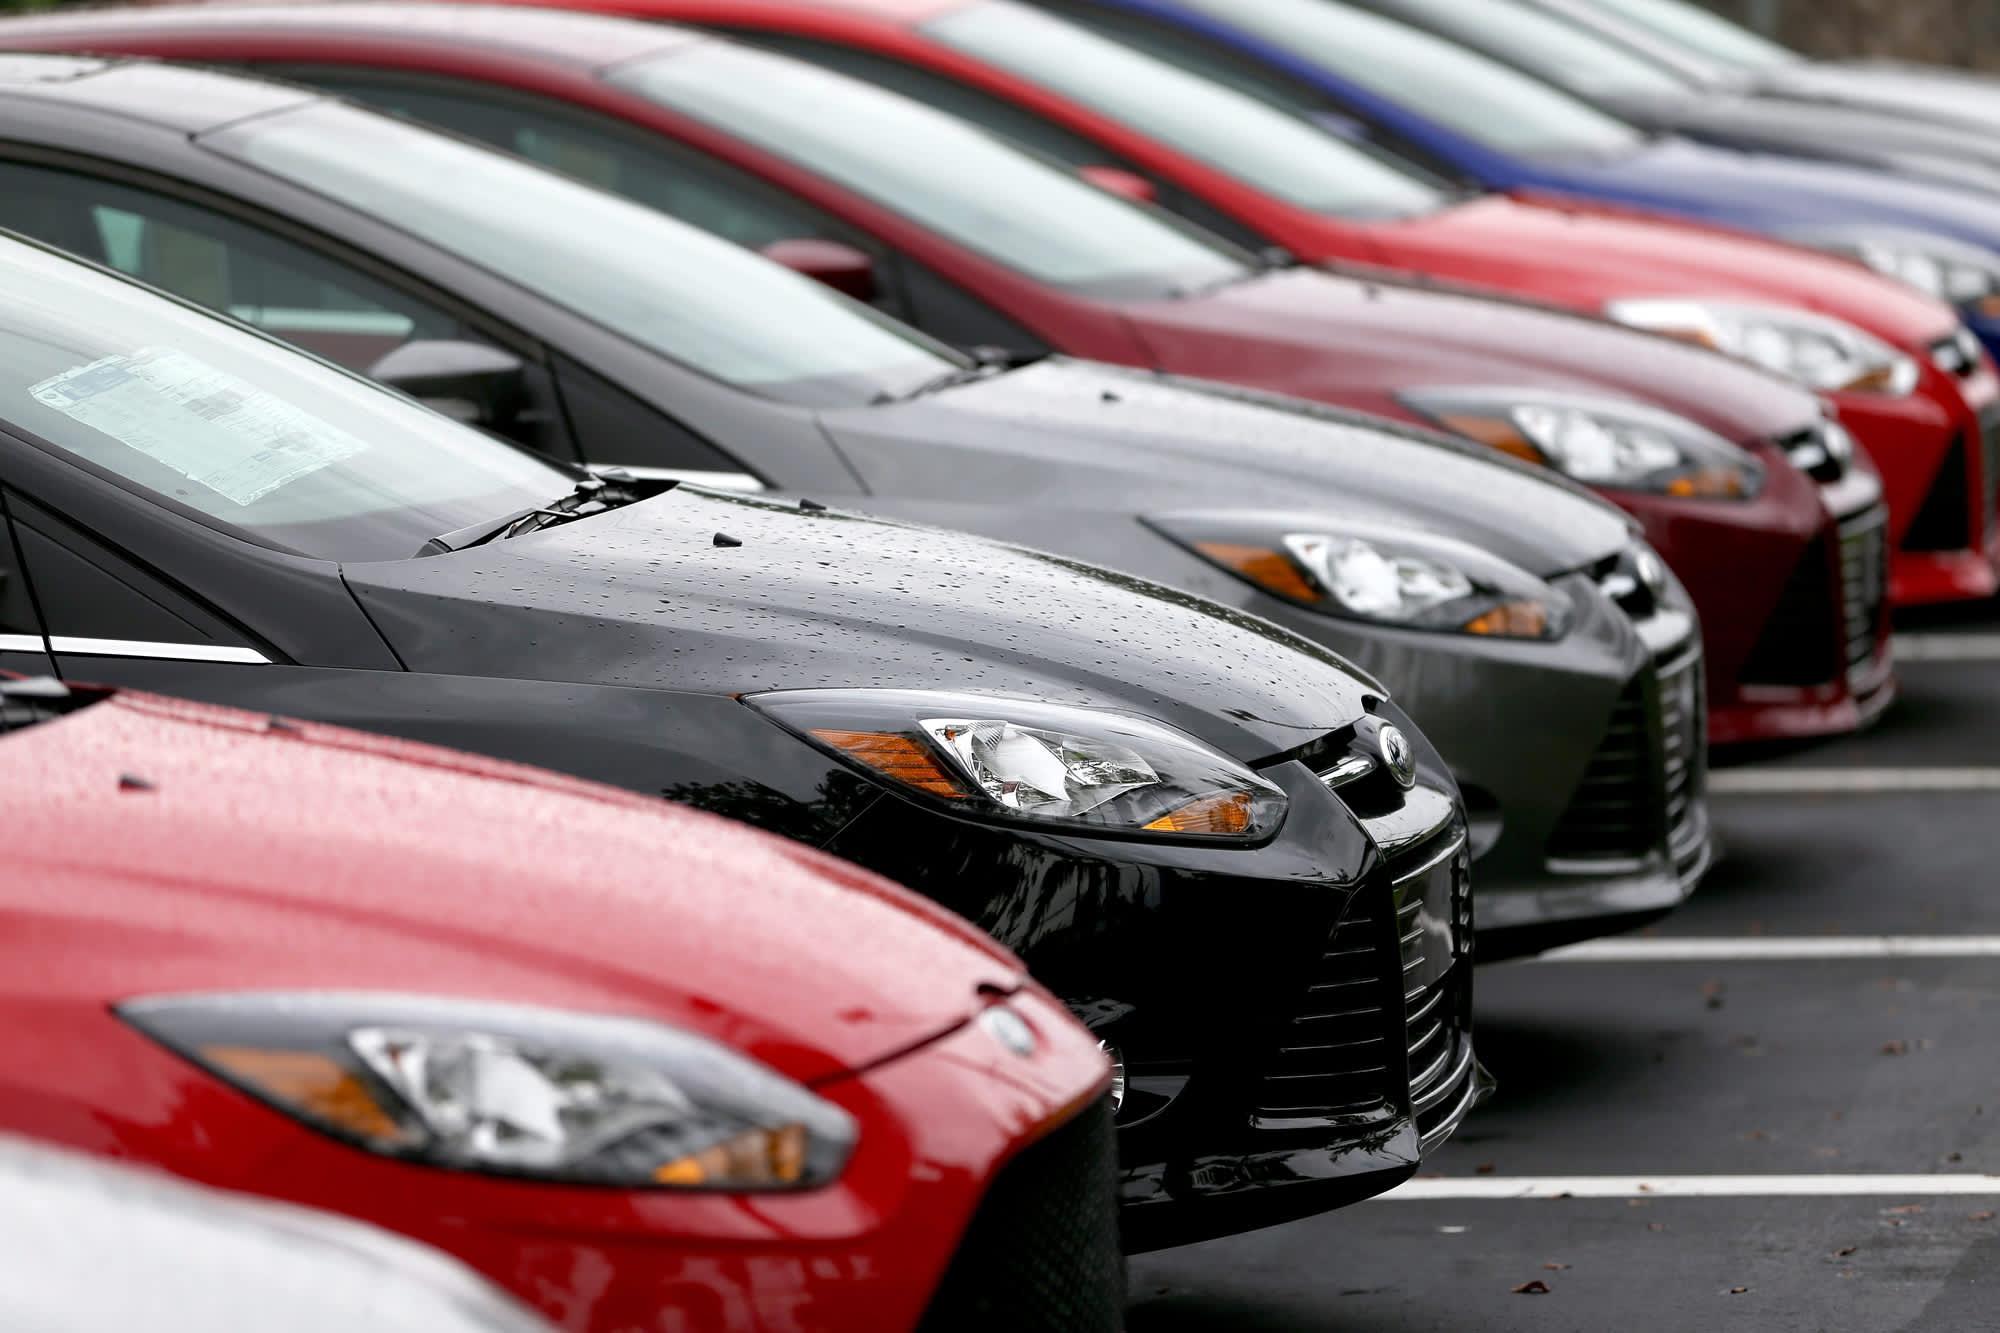 & Ford retains worldu0027s top selling car with Focus markmcfarlin.com